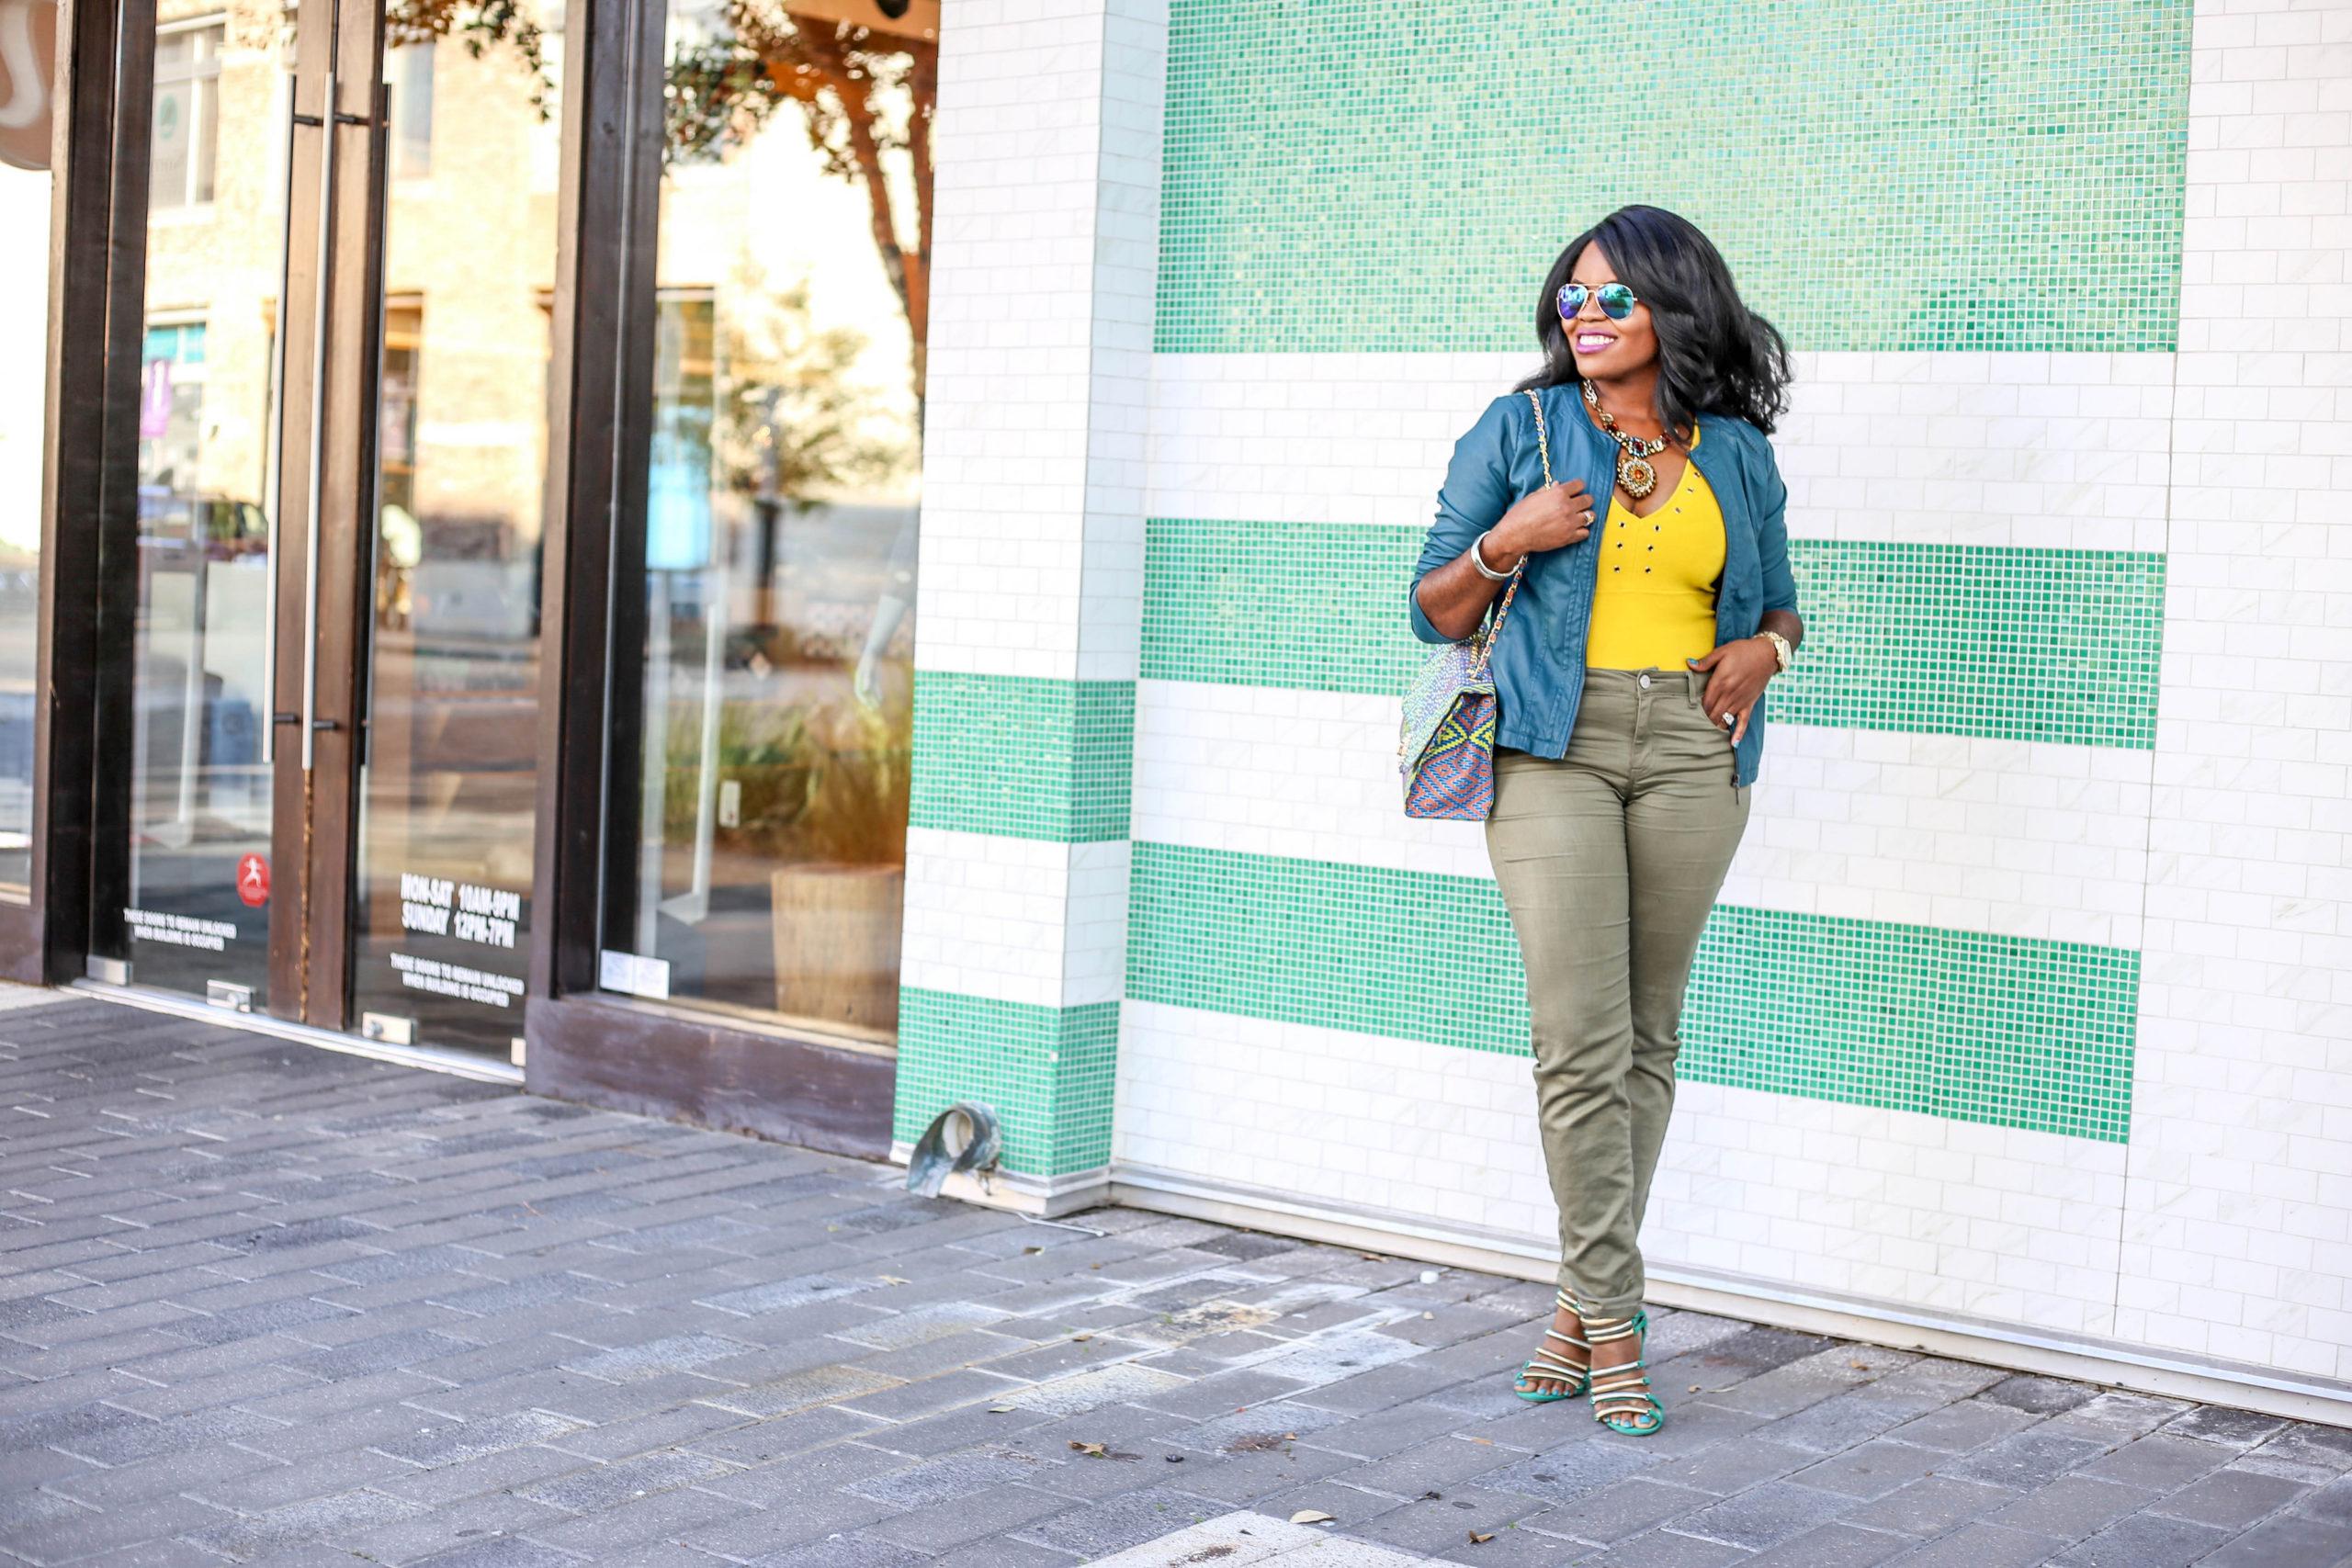 Chigis World Leather Jacket Skinny Jeans African Print Ankara Dashiki Rhinestone Bling Handbag Shoedazzle Shoes